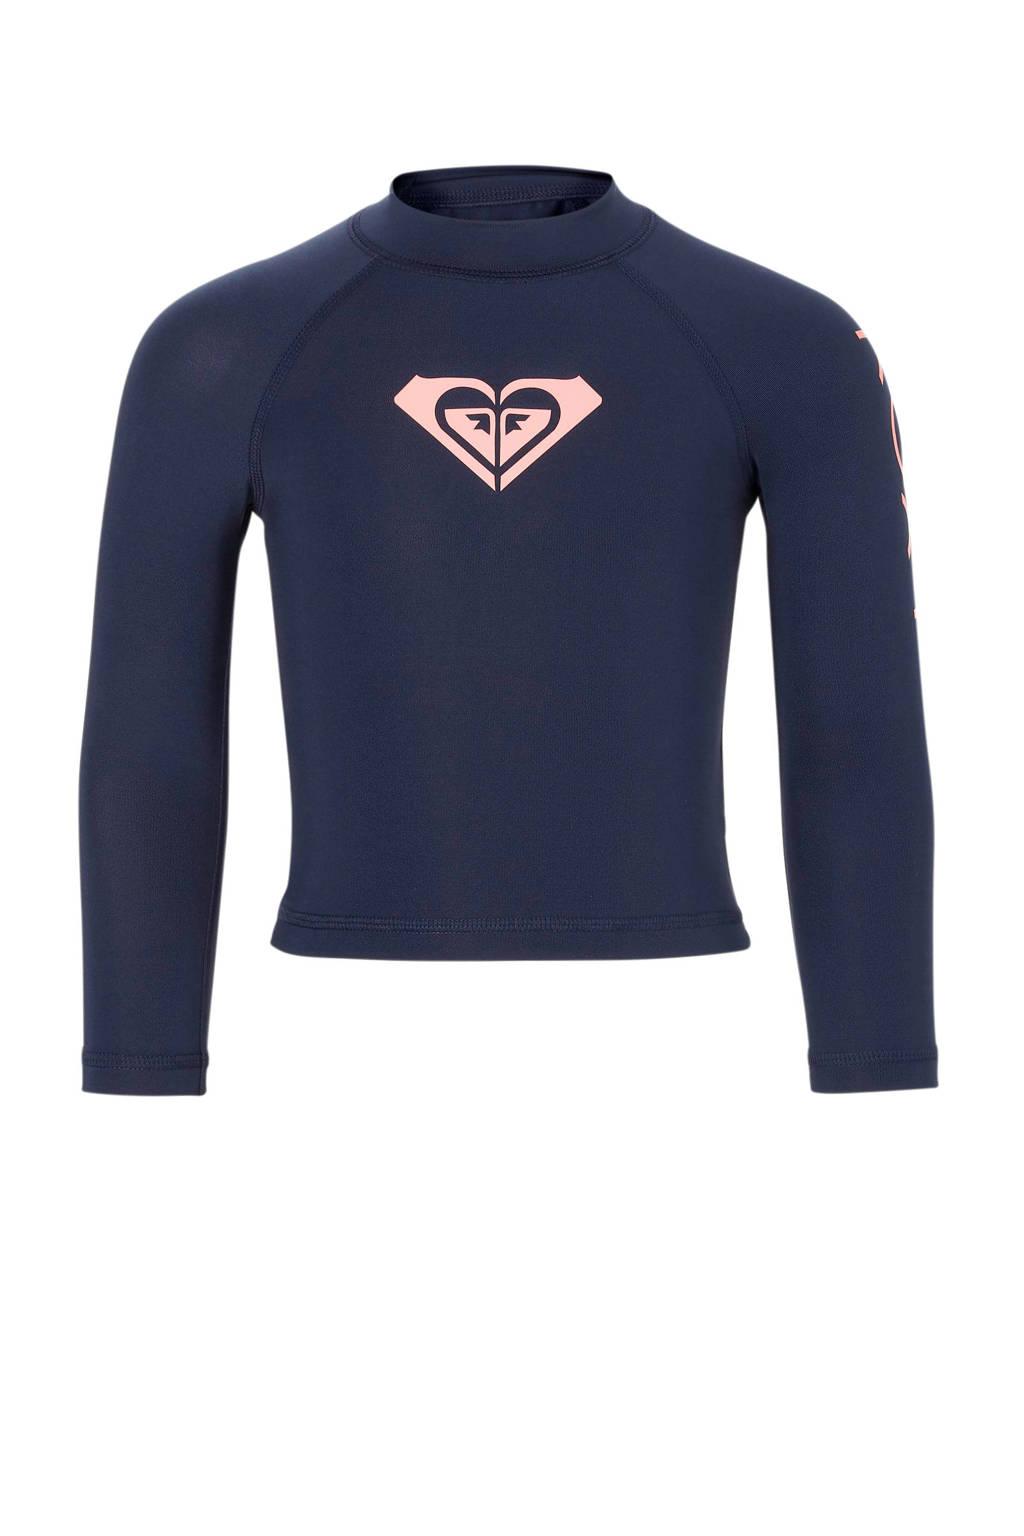 Roxy UV T-shirt met lange mouwen blauw, Blauw/roze